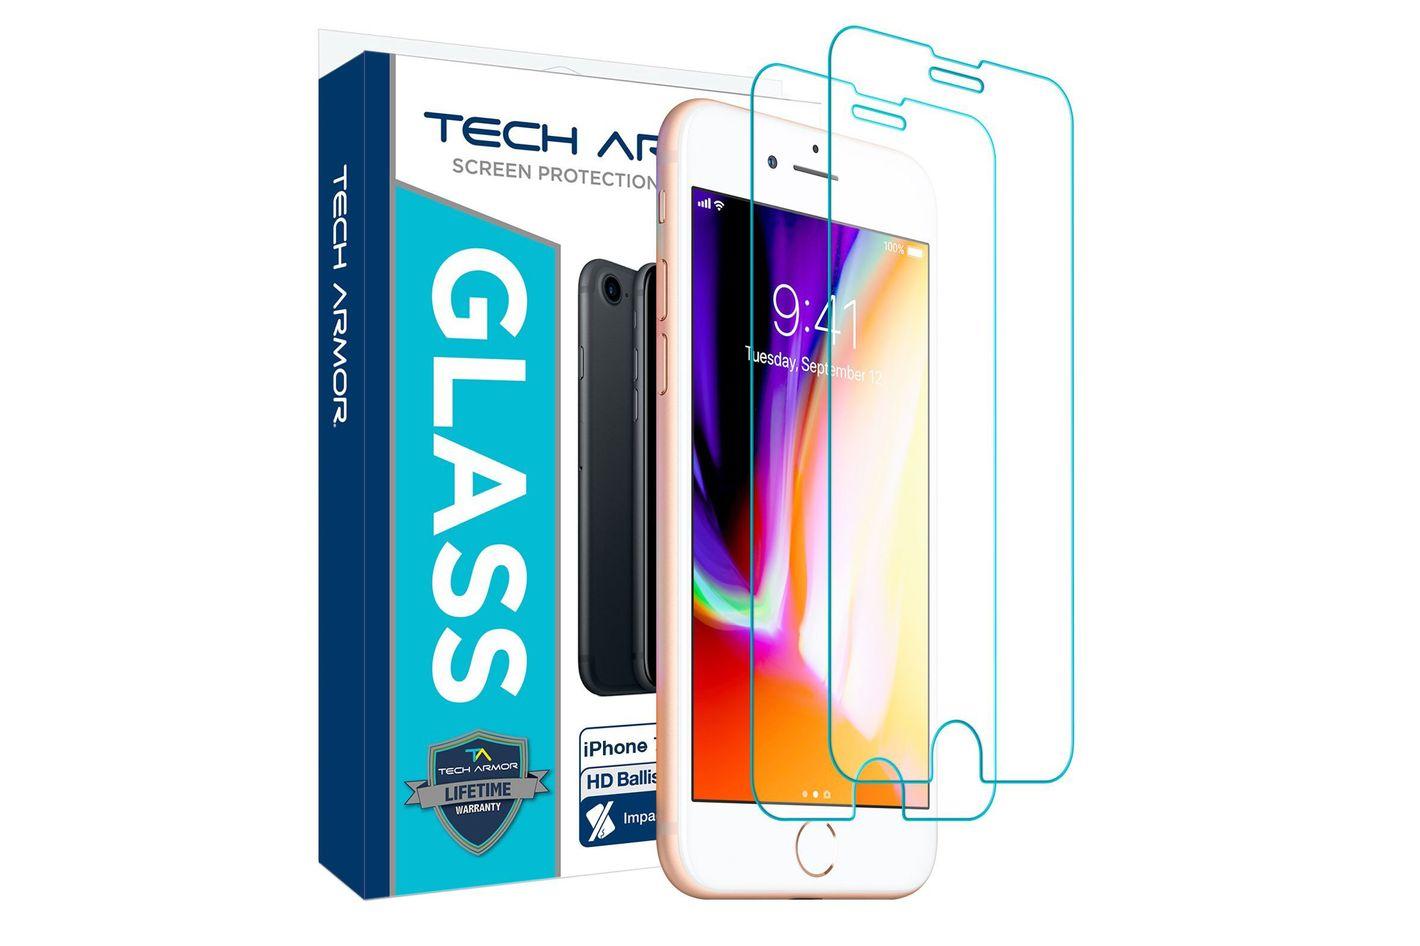 Tech Armor Apple iPhone 7, iPhone 6, iPhone 8 Ballistic Glass Screen Protector [2-Pack]